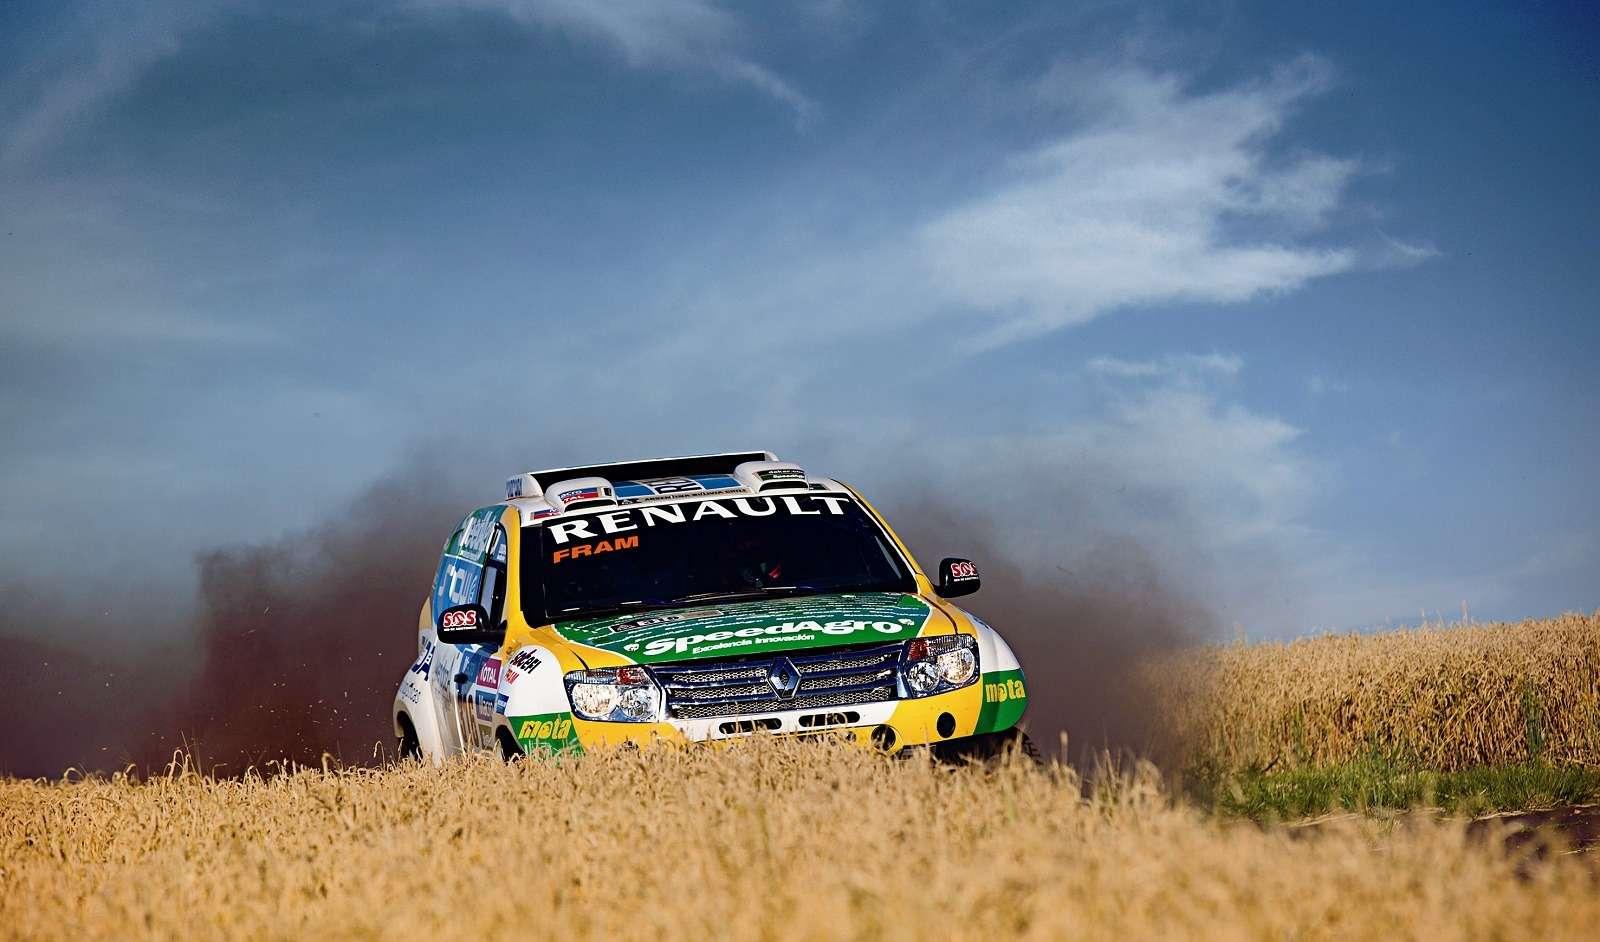 Команда Renault Duster планирует войти впервую десятку наралли «Дакар»— фото 364744